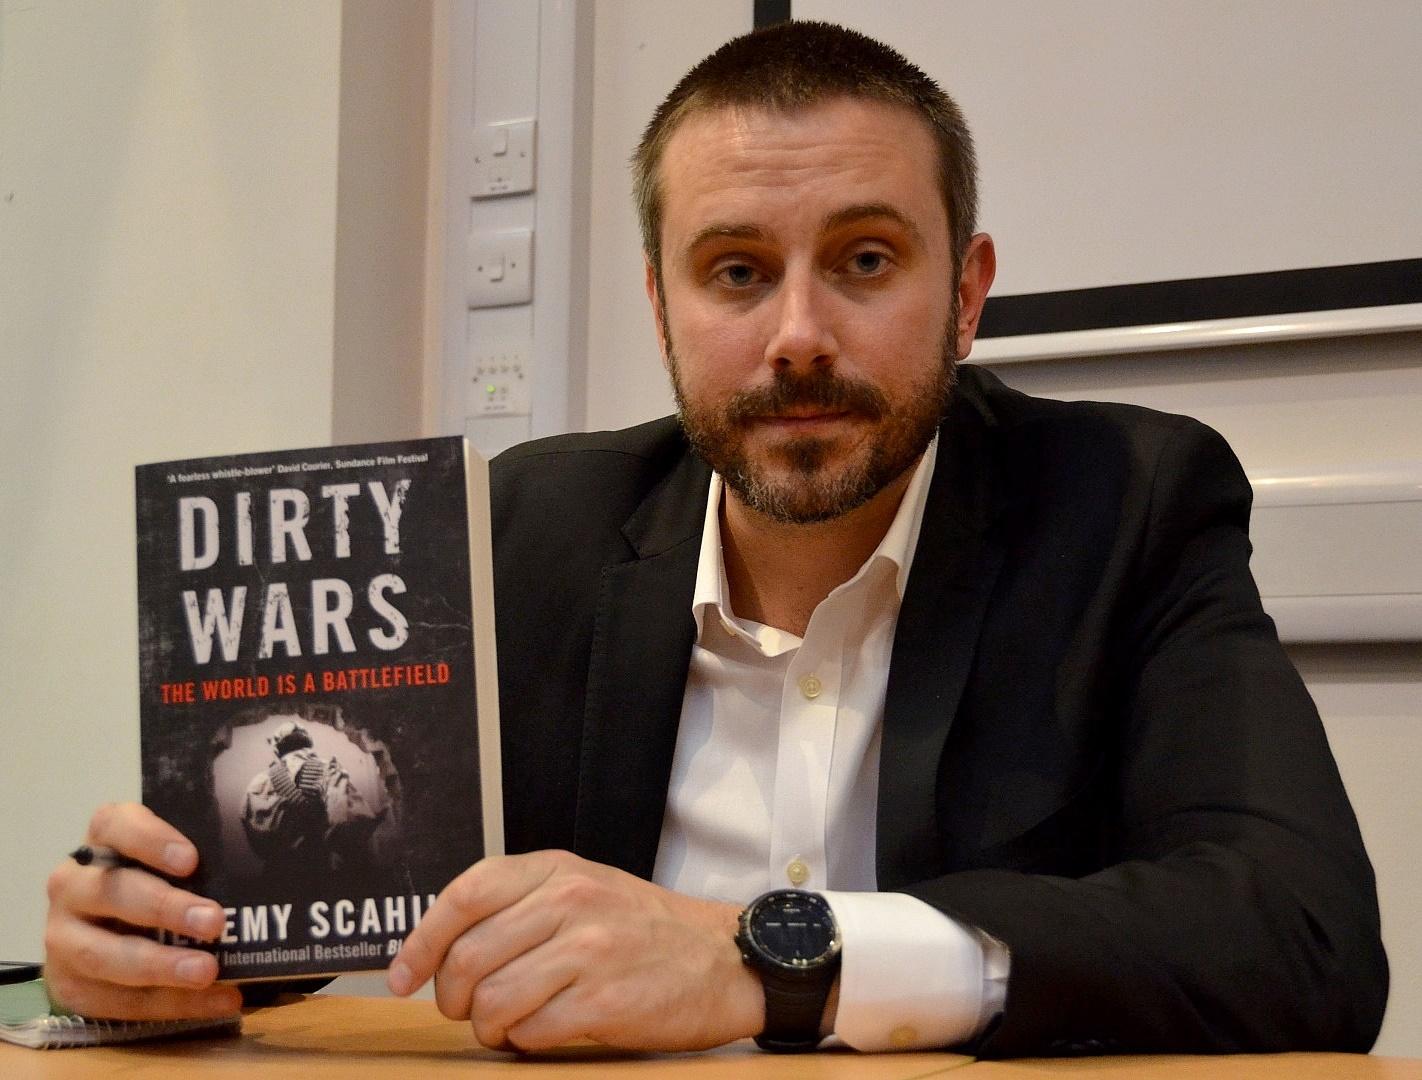 Jeremy Scahil writes Anti-American propaganda books